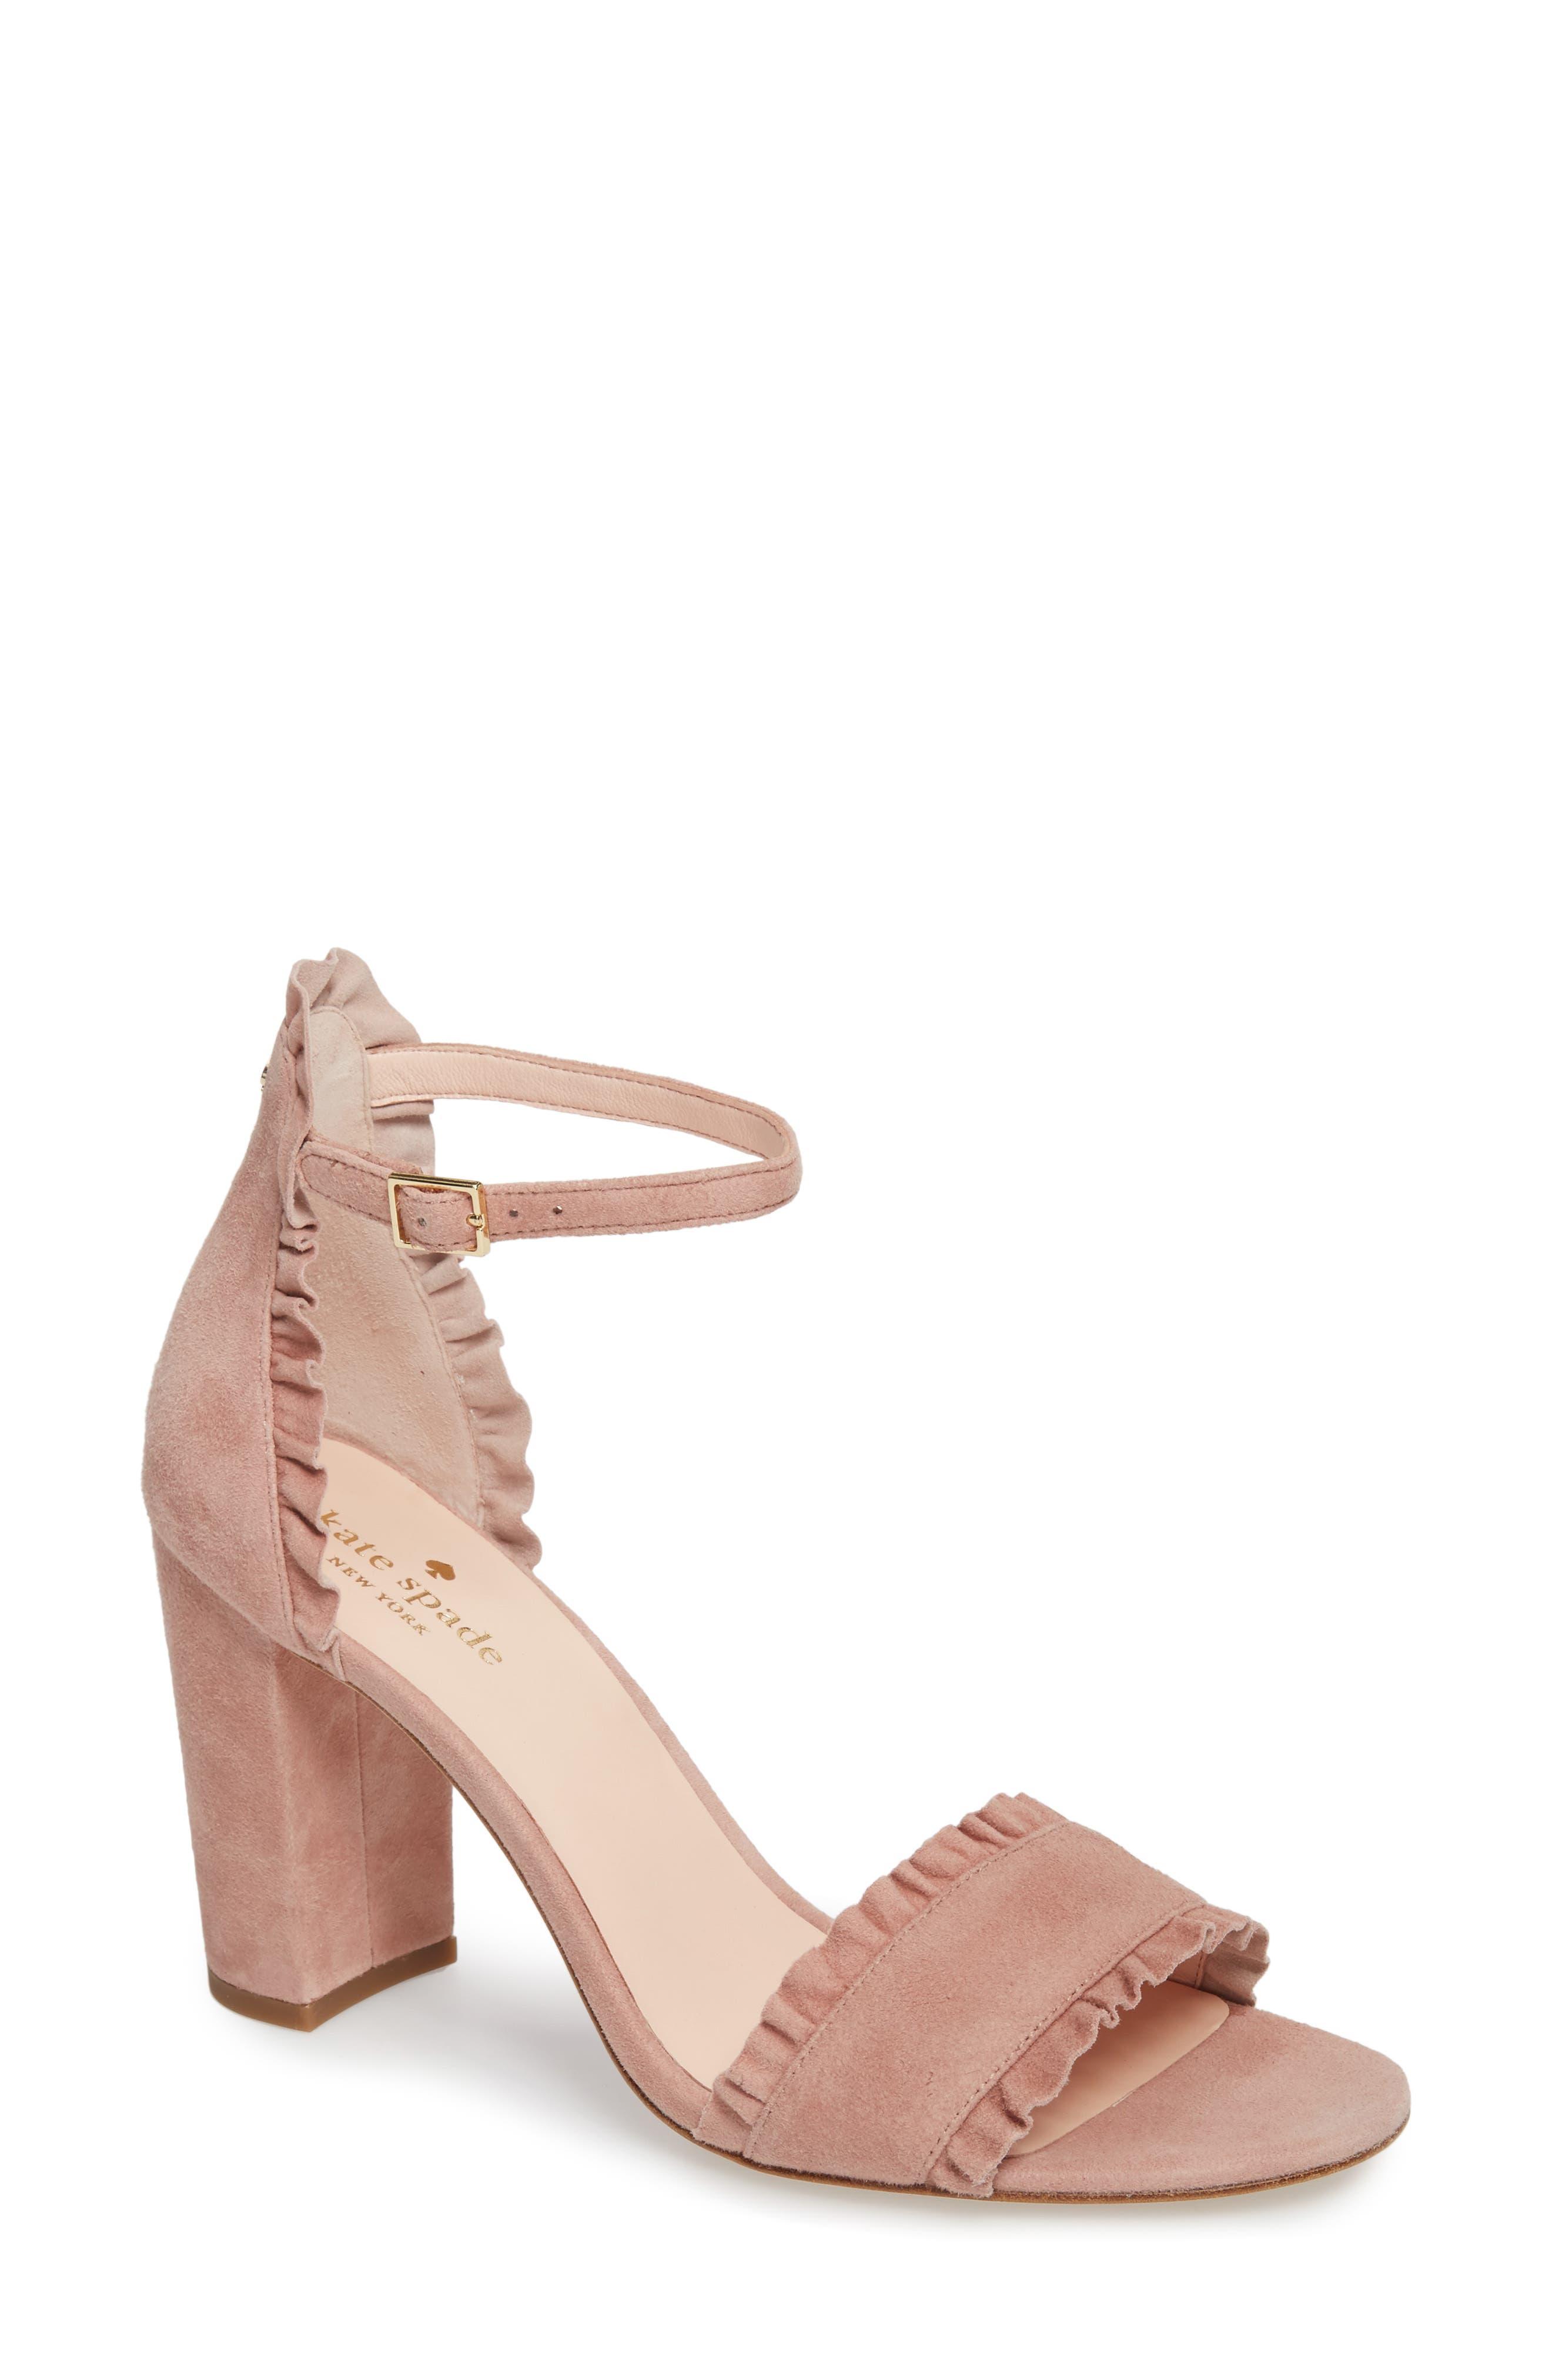 47537a49760b Kate Spade Odele Suede Ruffle City Sandal In Black Suede